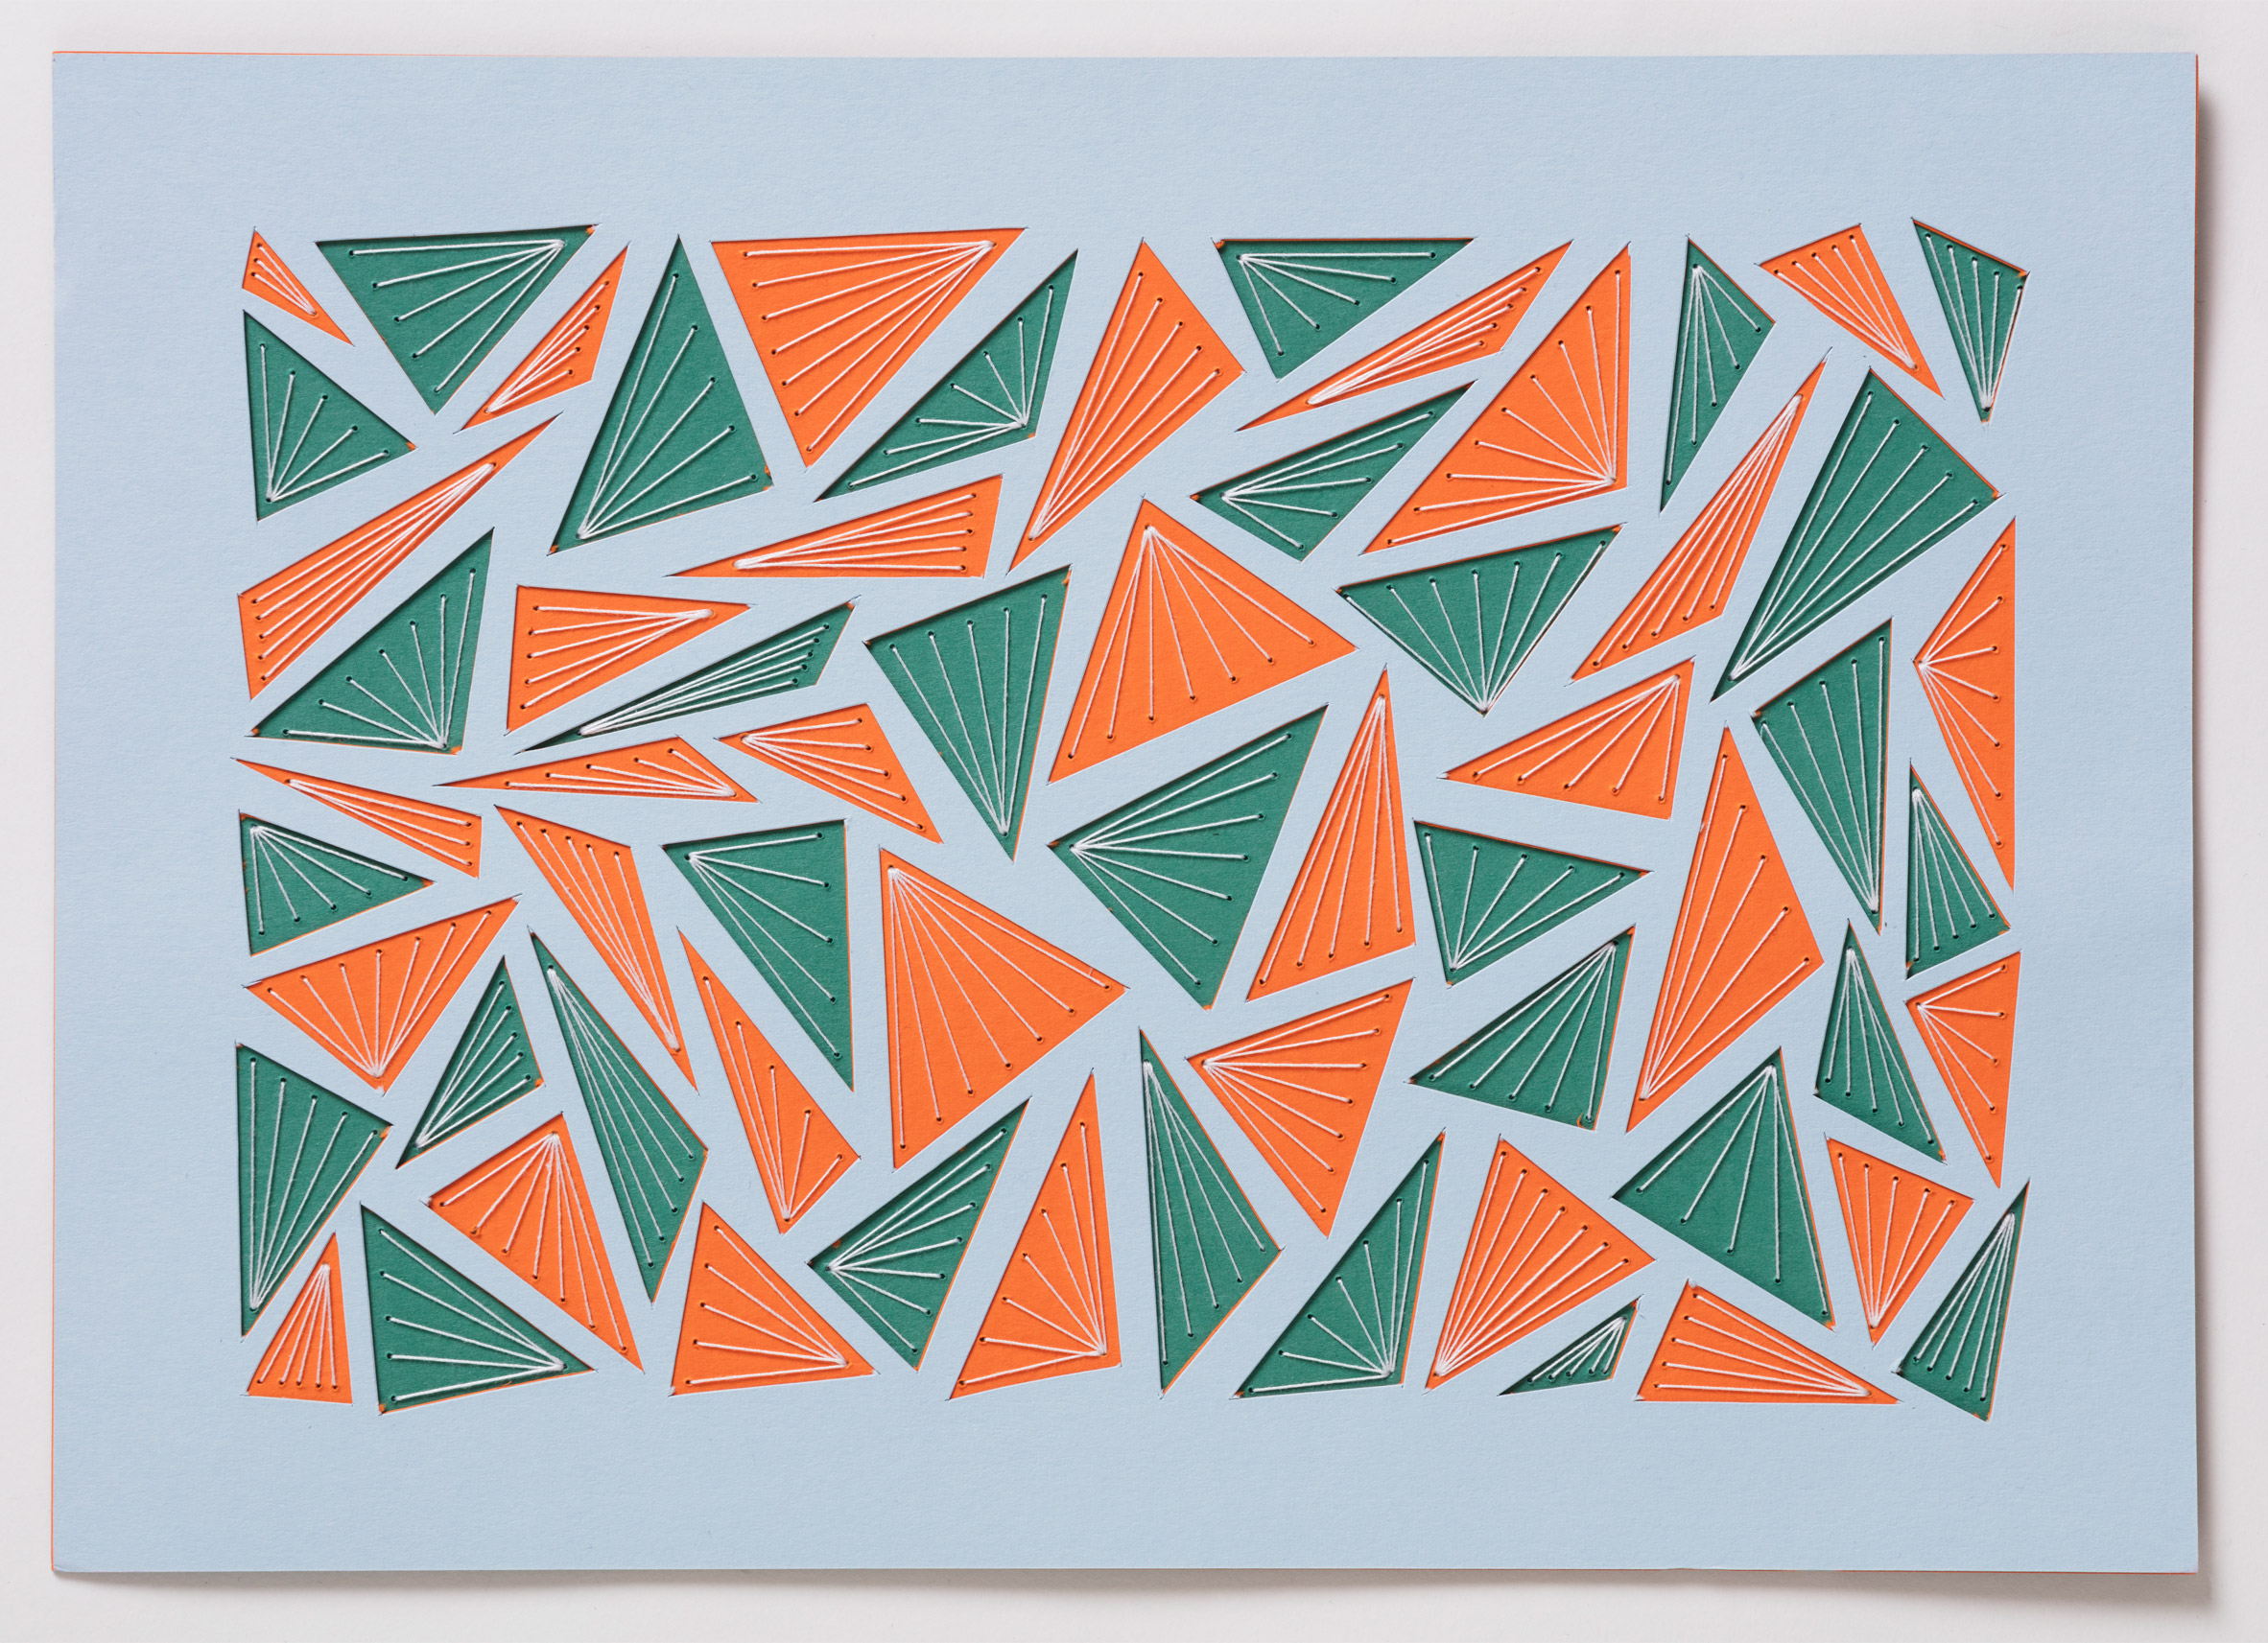 Jasper Morrison, John Pawson and Amanda Levete create works for Maggie's charity auction